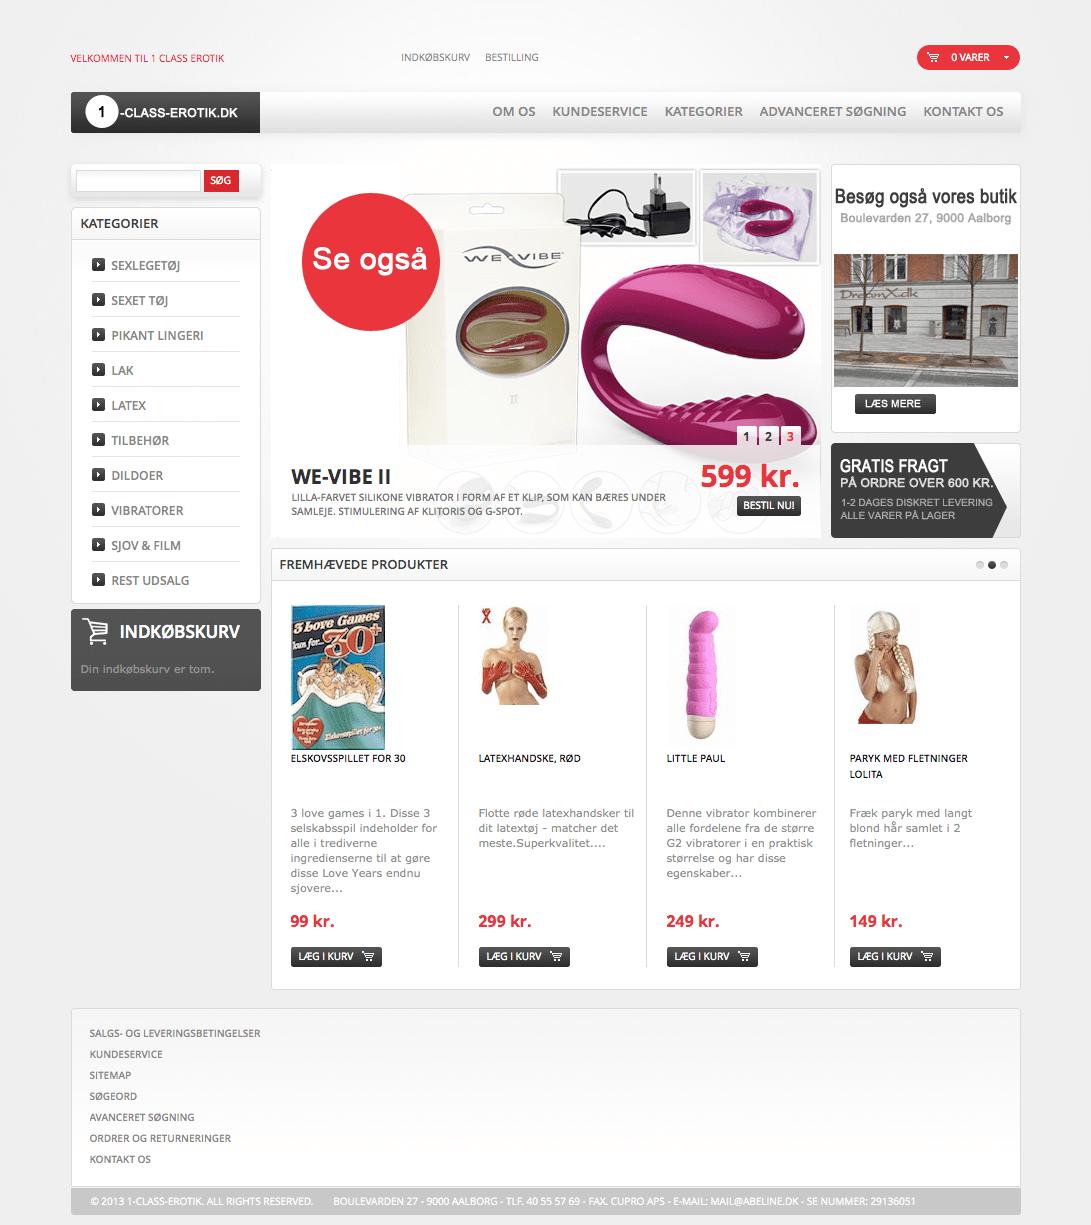 Projekter: 1-class-erotik.dk - Magento Webshop